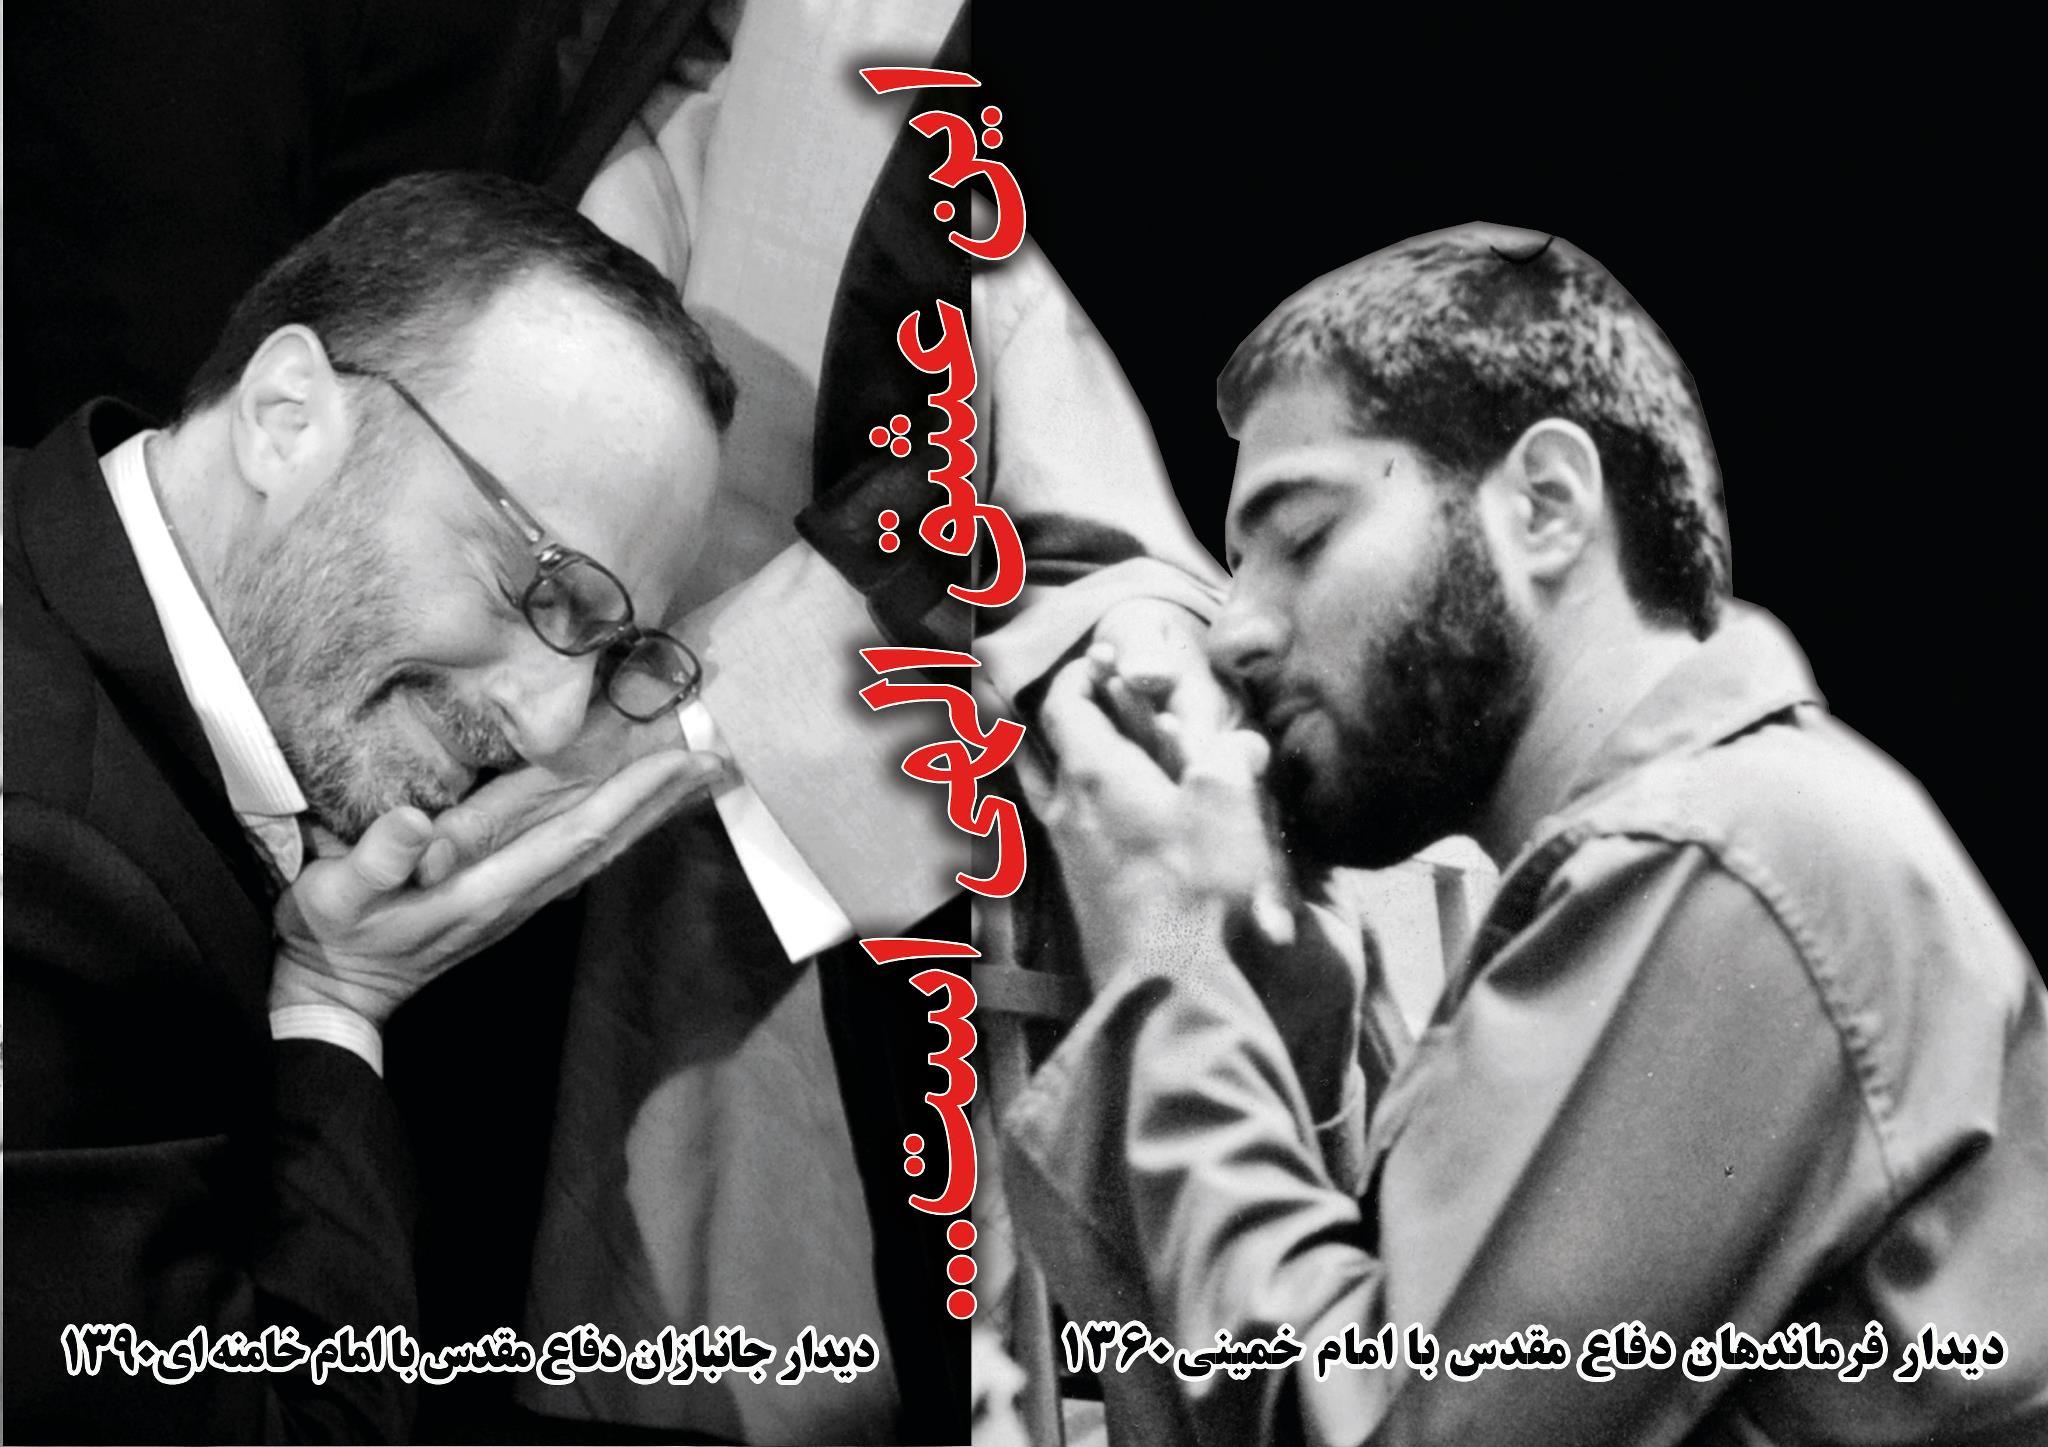 http://bachehayeghalam.ir/wp-content/uploads/2011/10/emam-agha.jpg